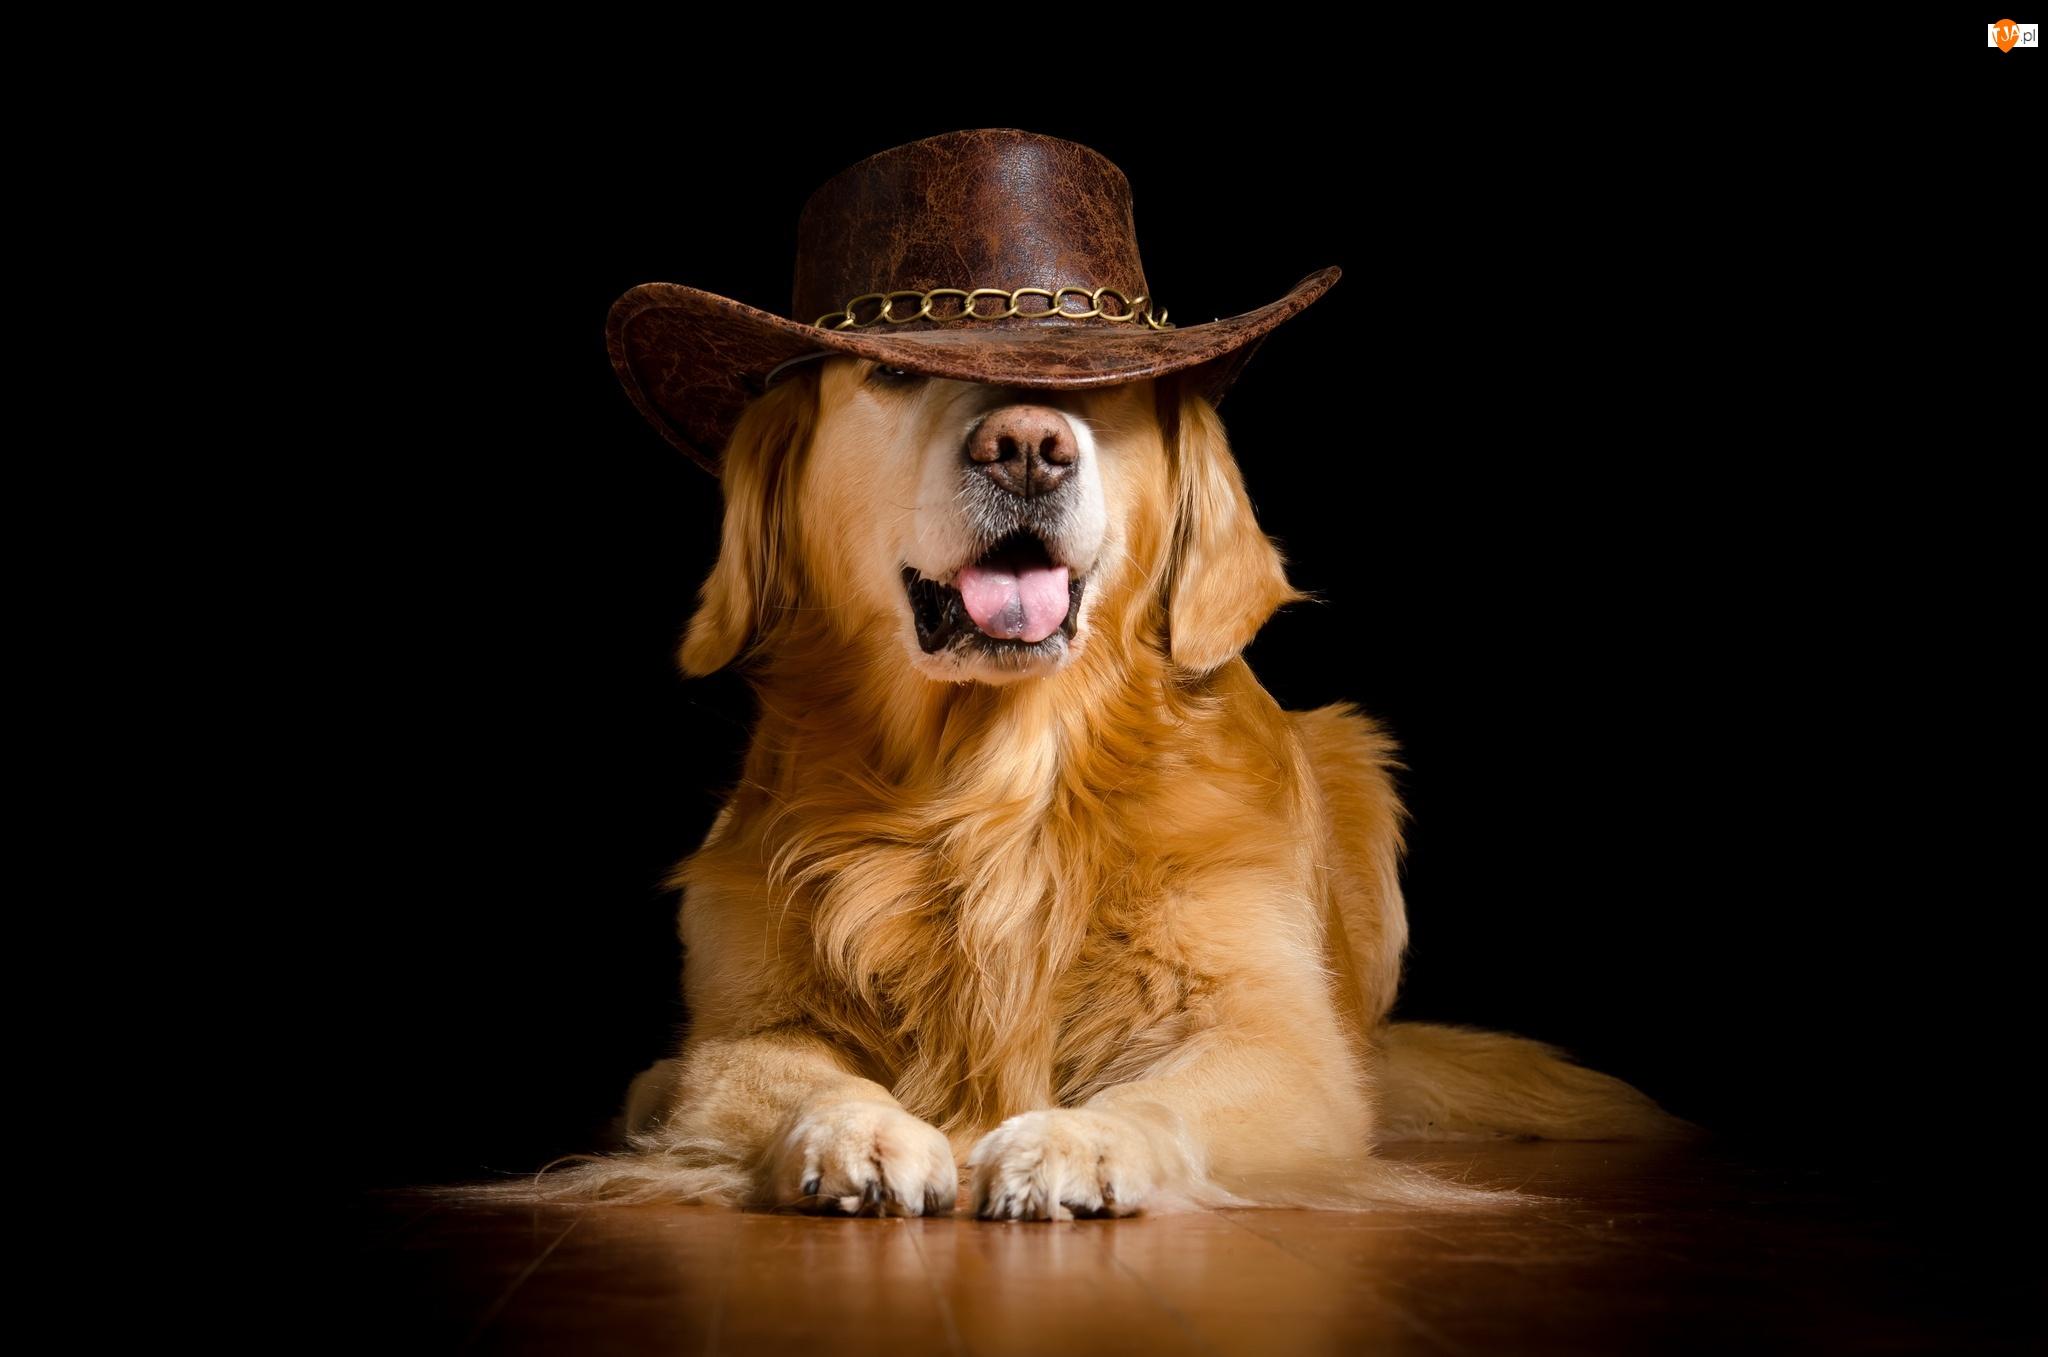 Kapelusz, Śmieszne, Pies, Golden retriever